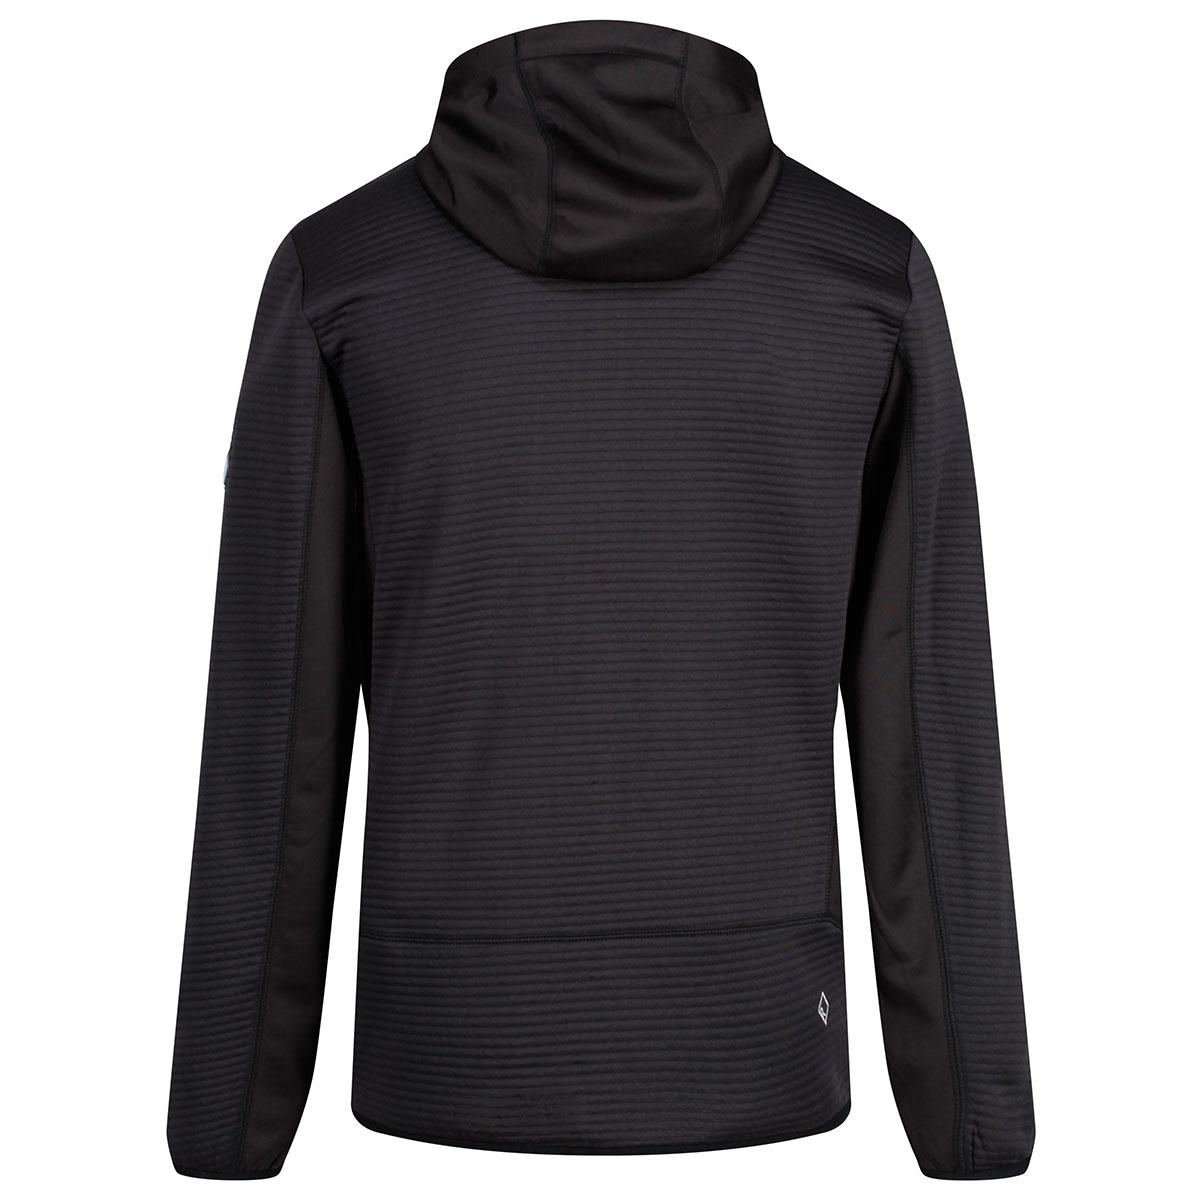 Regatta-Mens-Tarnis-II-Ribbed-Fabric-Stretch-Hoody-Jacket-70-OFF-RRP thumbnail 5